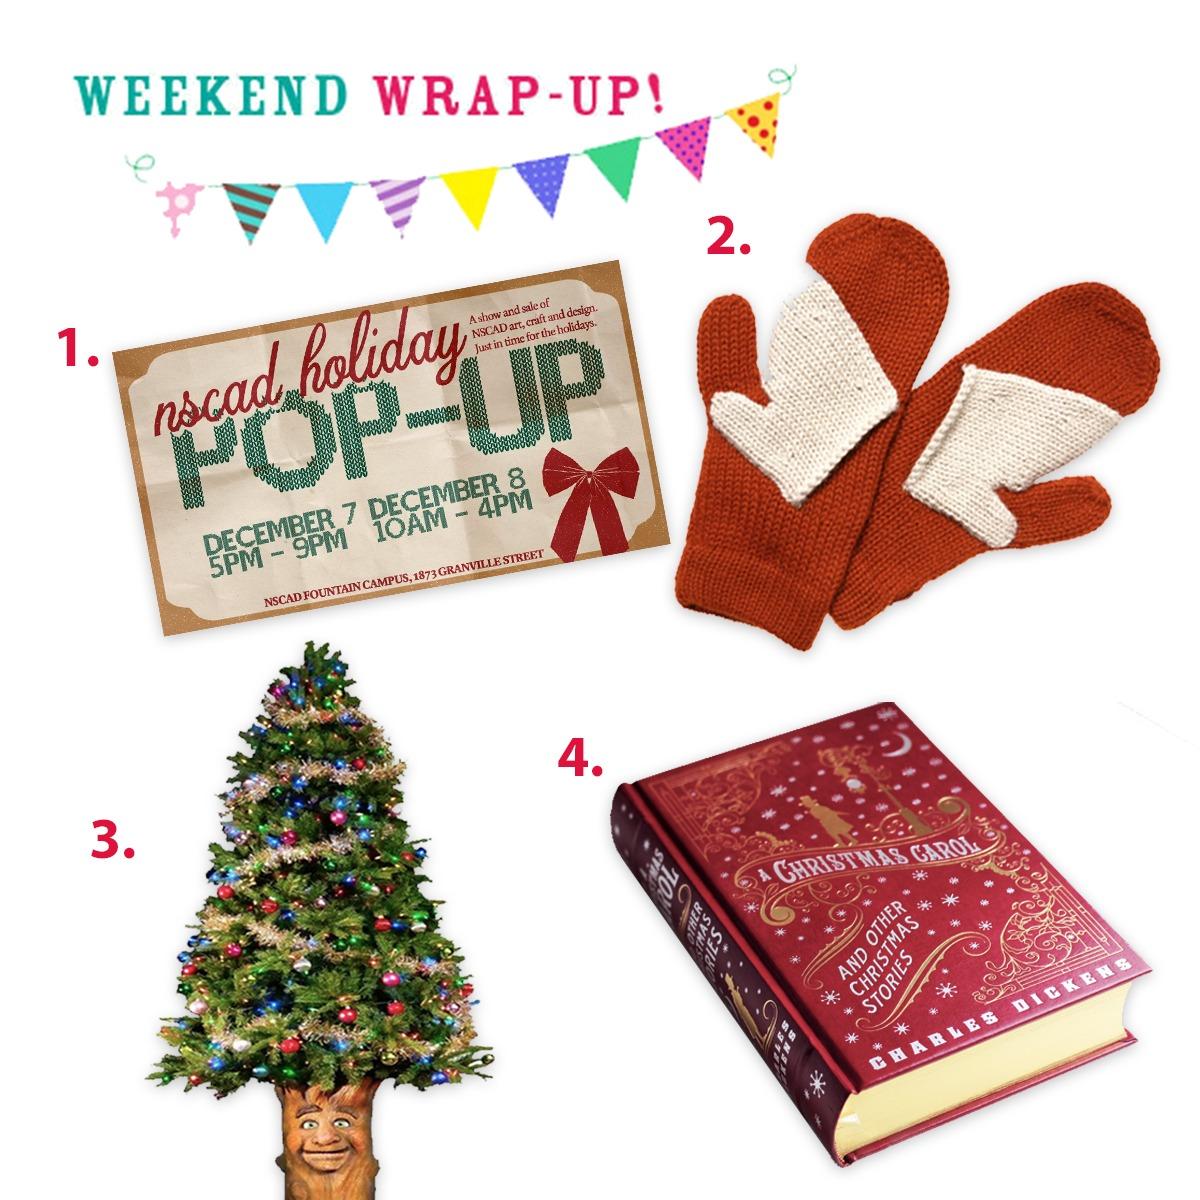 Weekend Wrap-Up, Dec 7-9, 2018   Urban Parent - Halifax